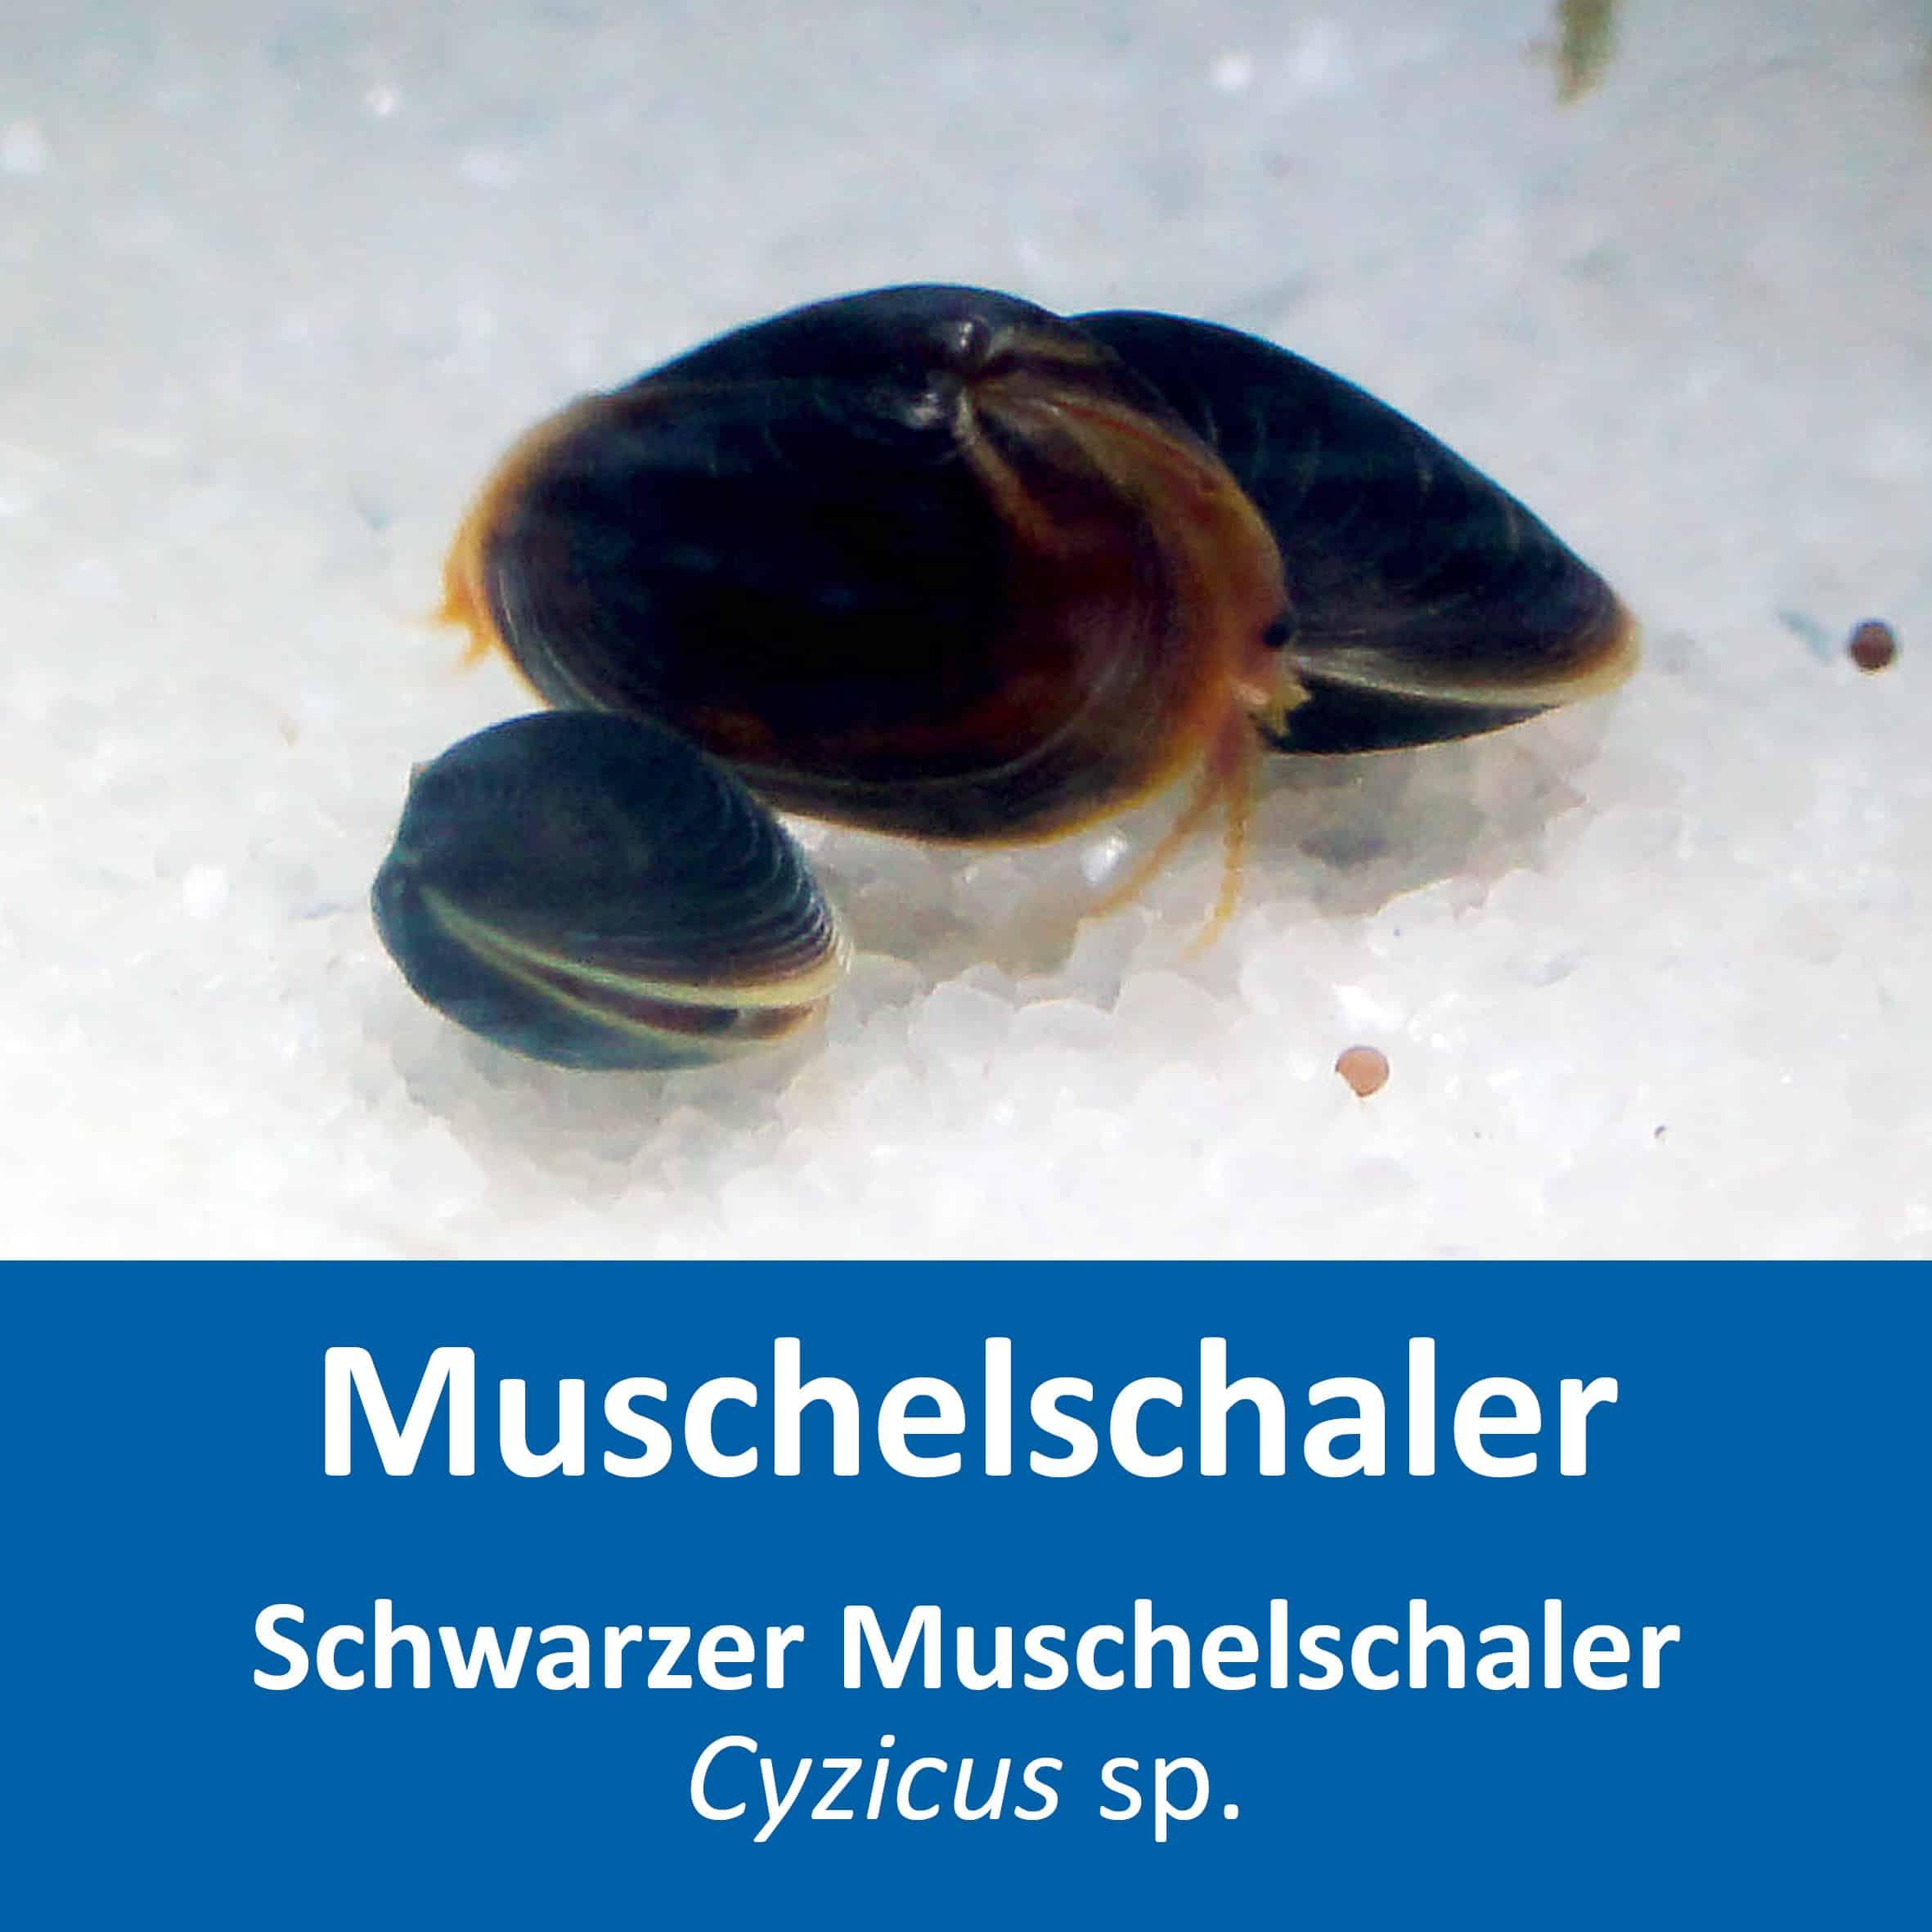 Cyzicus sp